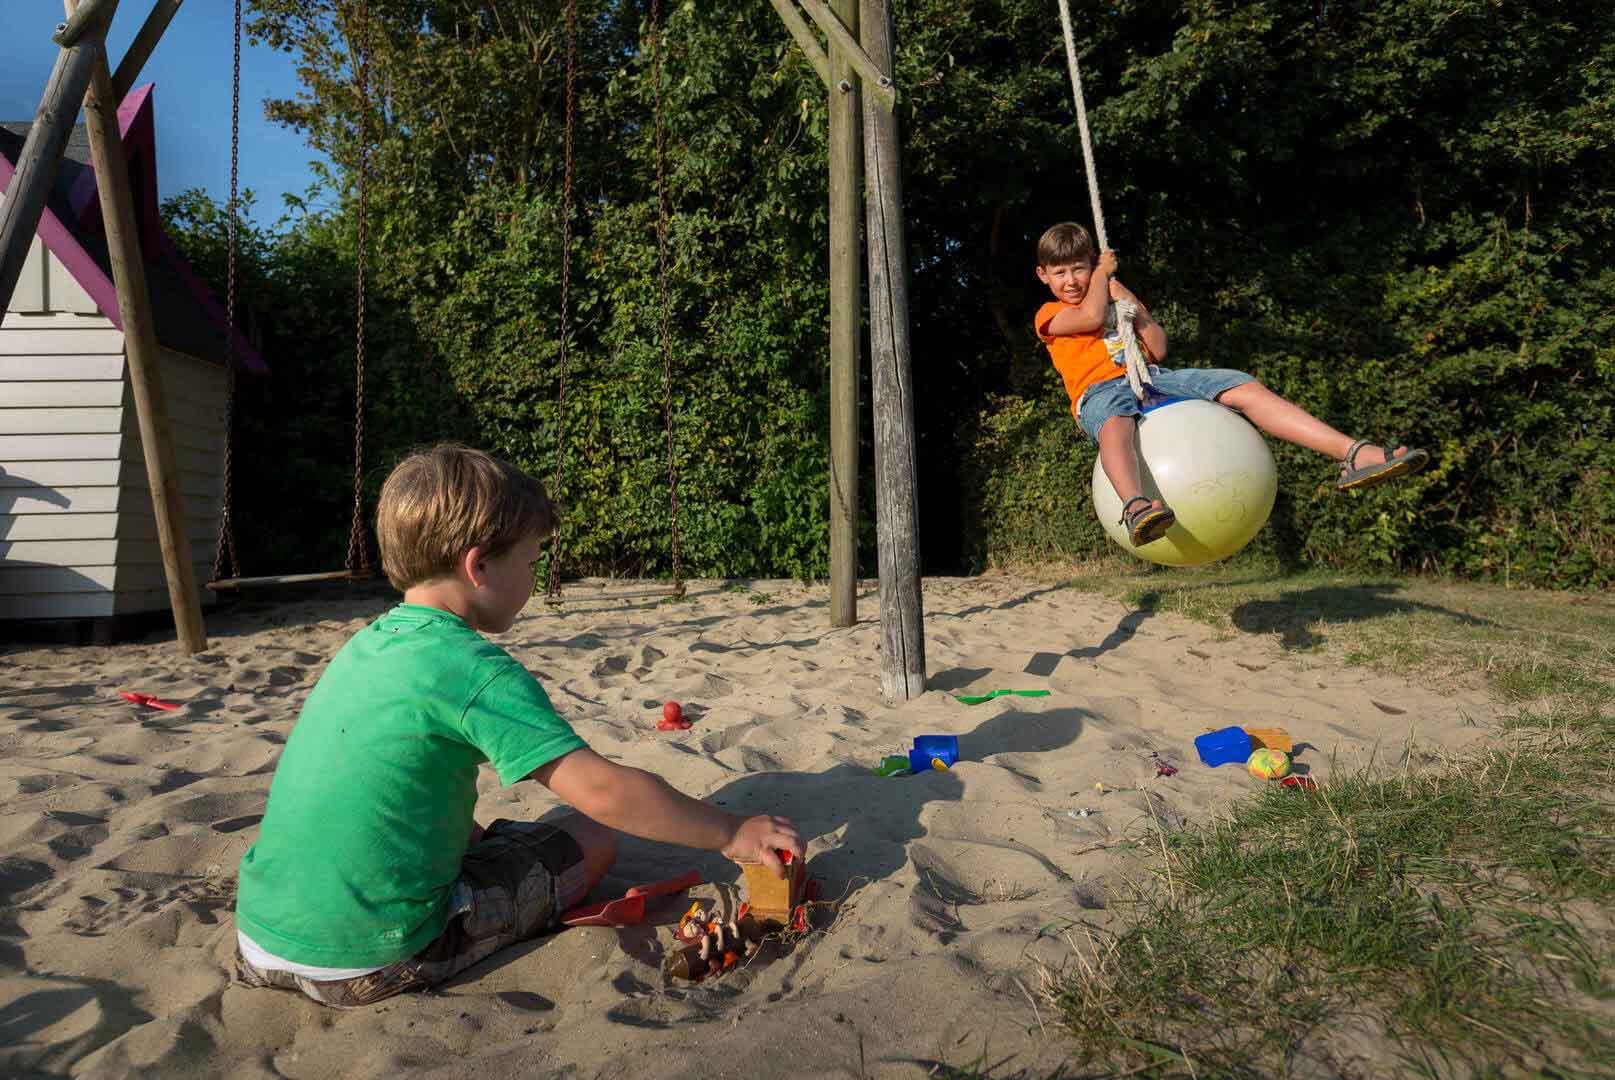 Bauernhof Camping mit Privatsanitär